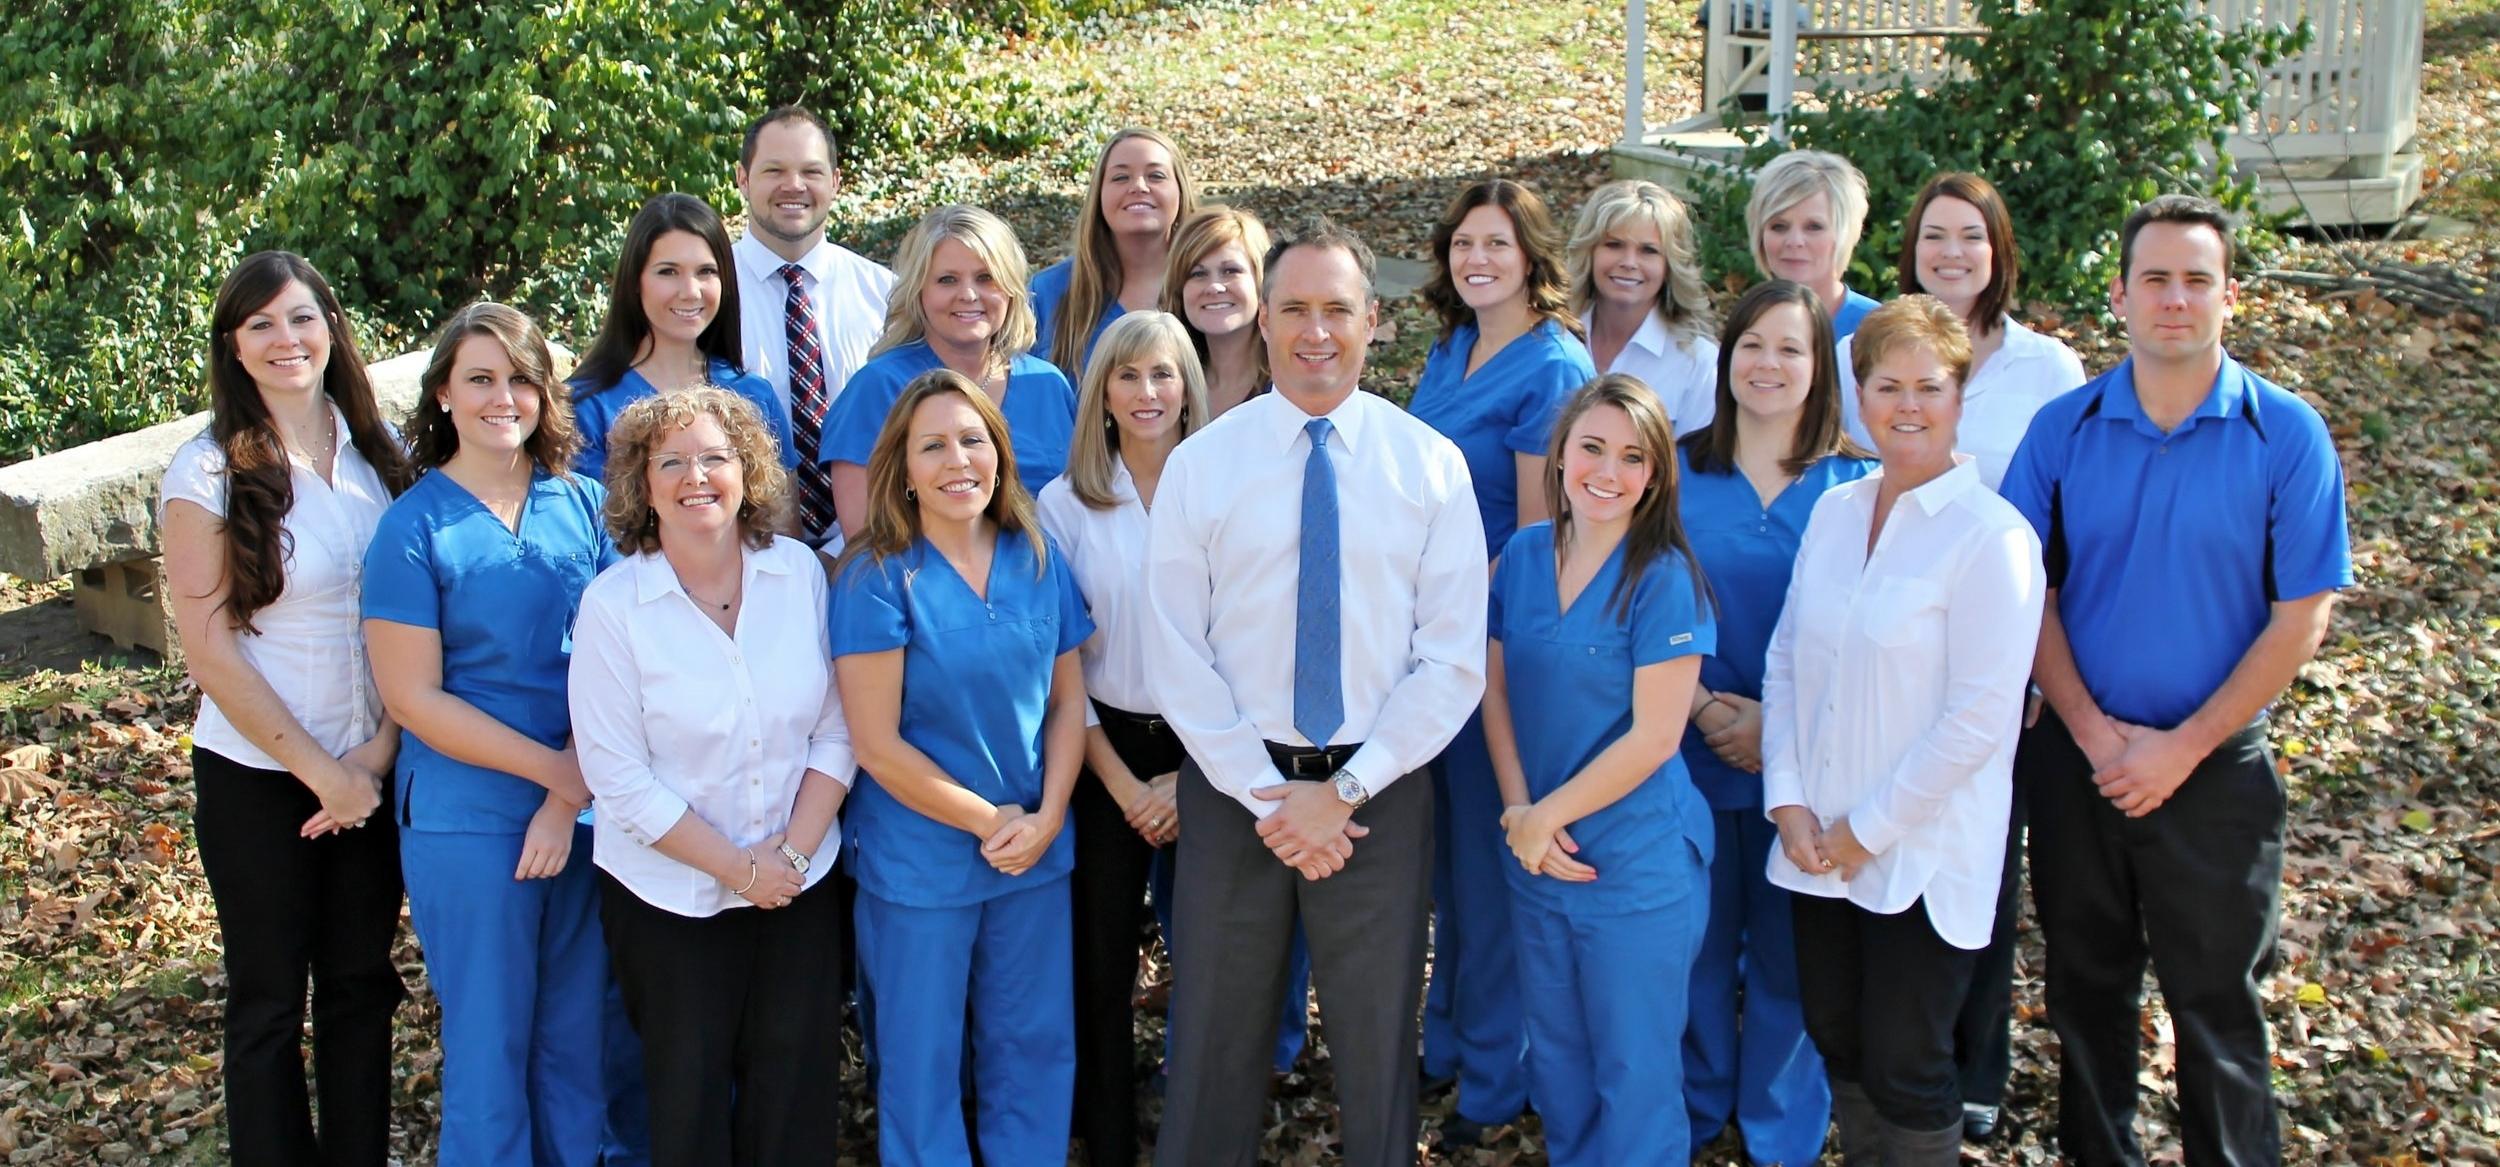 Embrace Your Smile - Burke Orthodontics